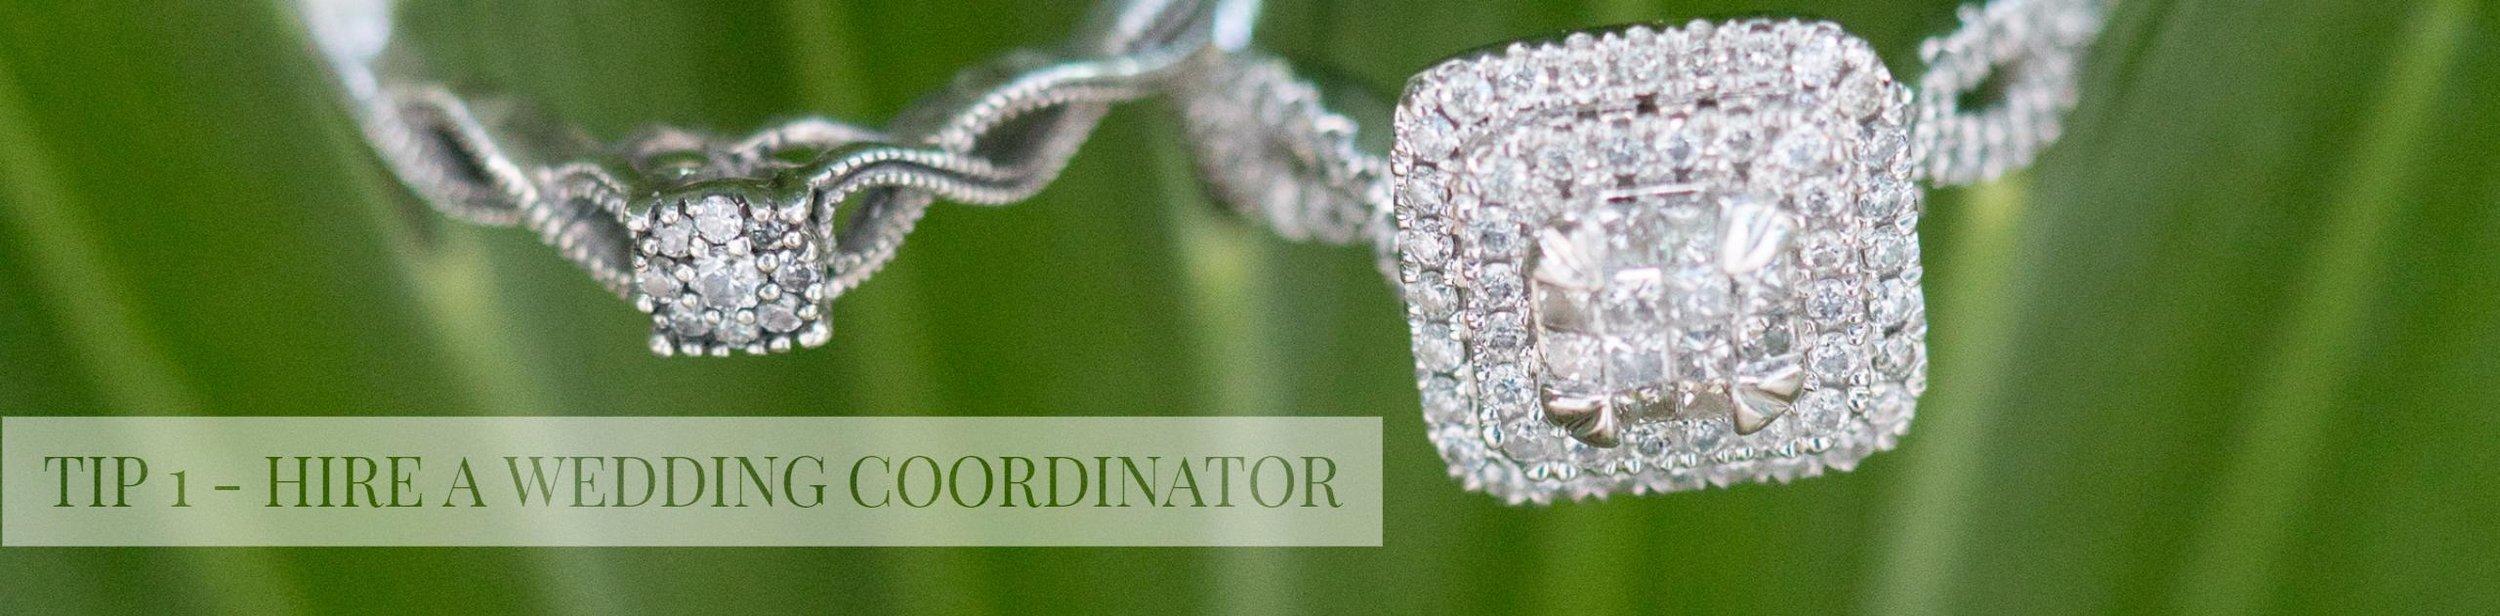 TIP 1 - HIRE A WEDDING COORDINATOR